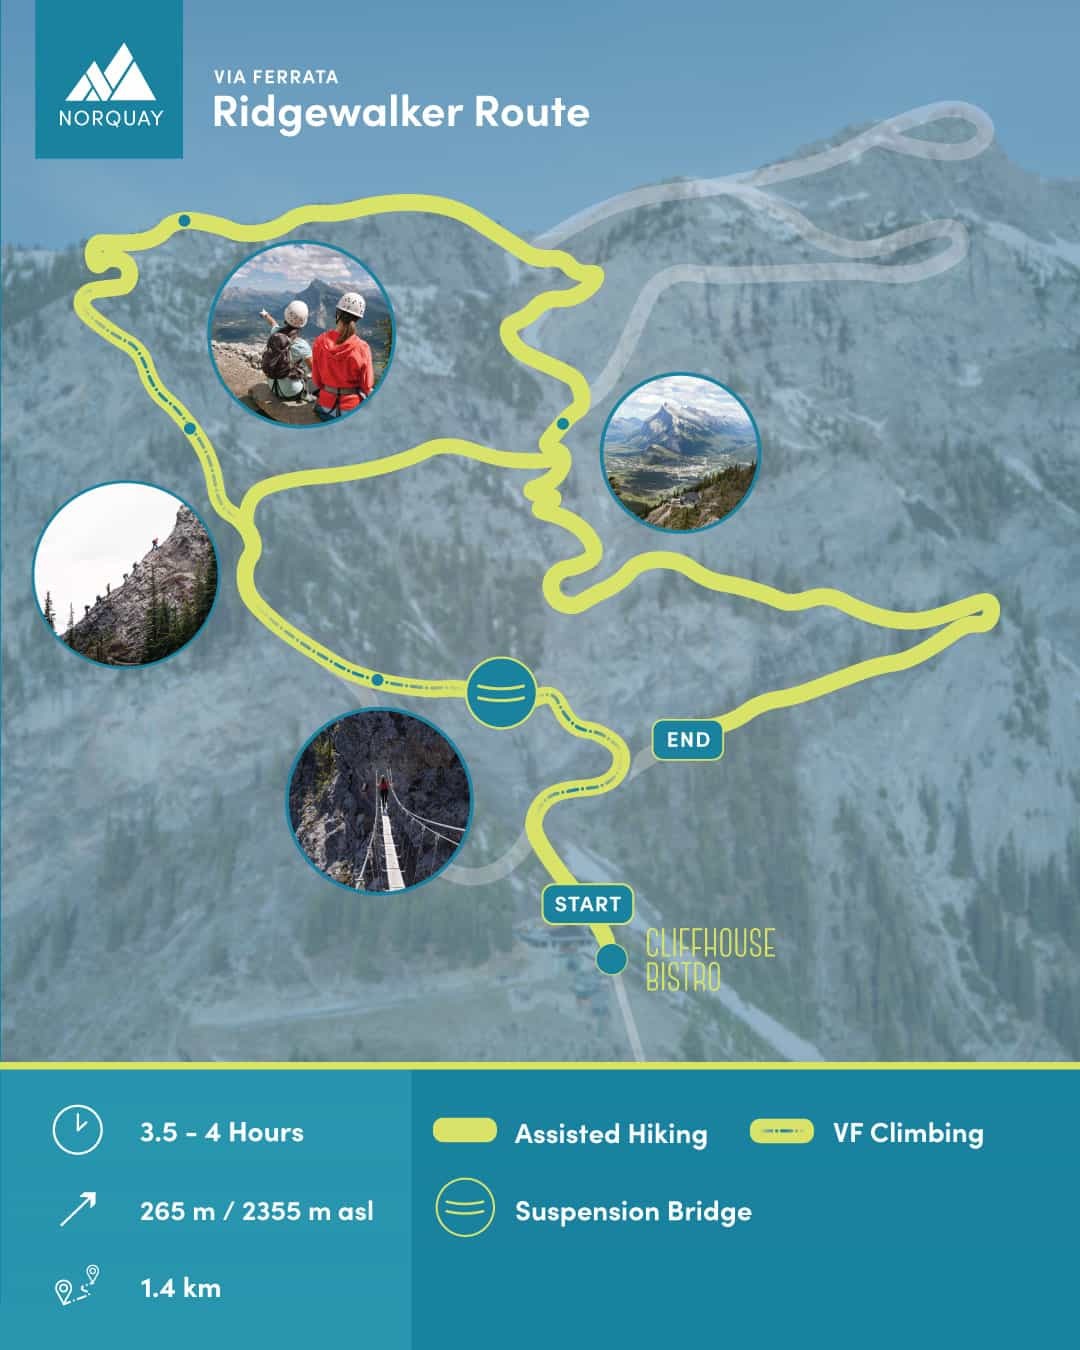 Via Ferrata Ridgewalker Route Map at Banff Mt Norquay